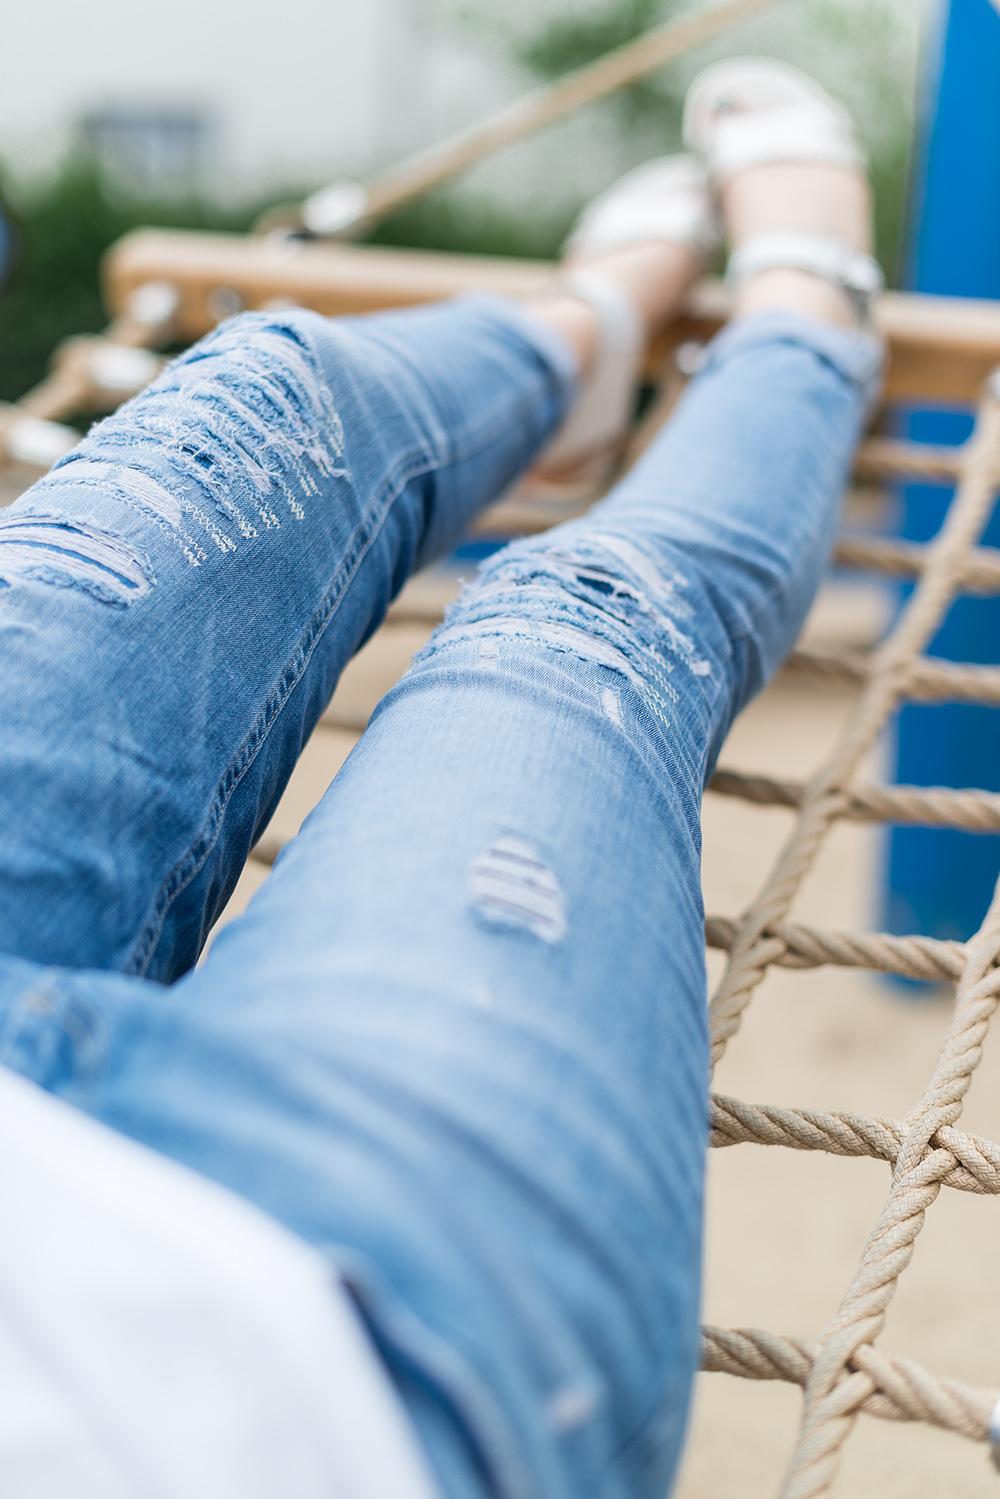 Modeblog-Deutschland-Deutsche-Mode-Mode-Influencer-Andrea-Funk-andysparkles-Berlin-Rheinufer-T-Shirt-Startnext_EMU-Sandalen-Marc-Aurel-Fashion-Jeans-Casual-Look